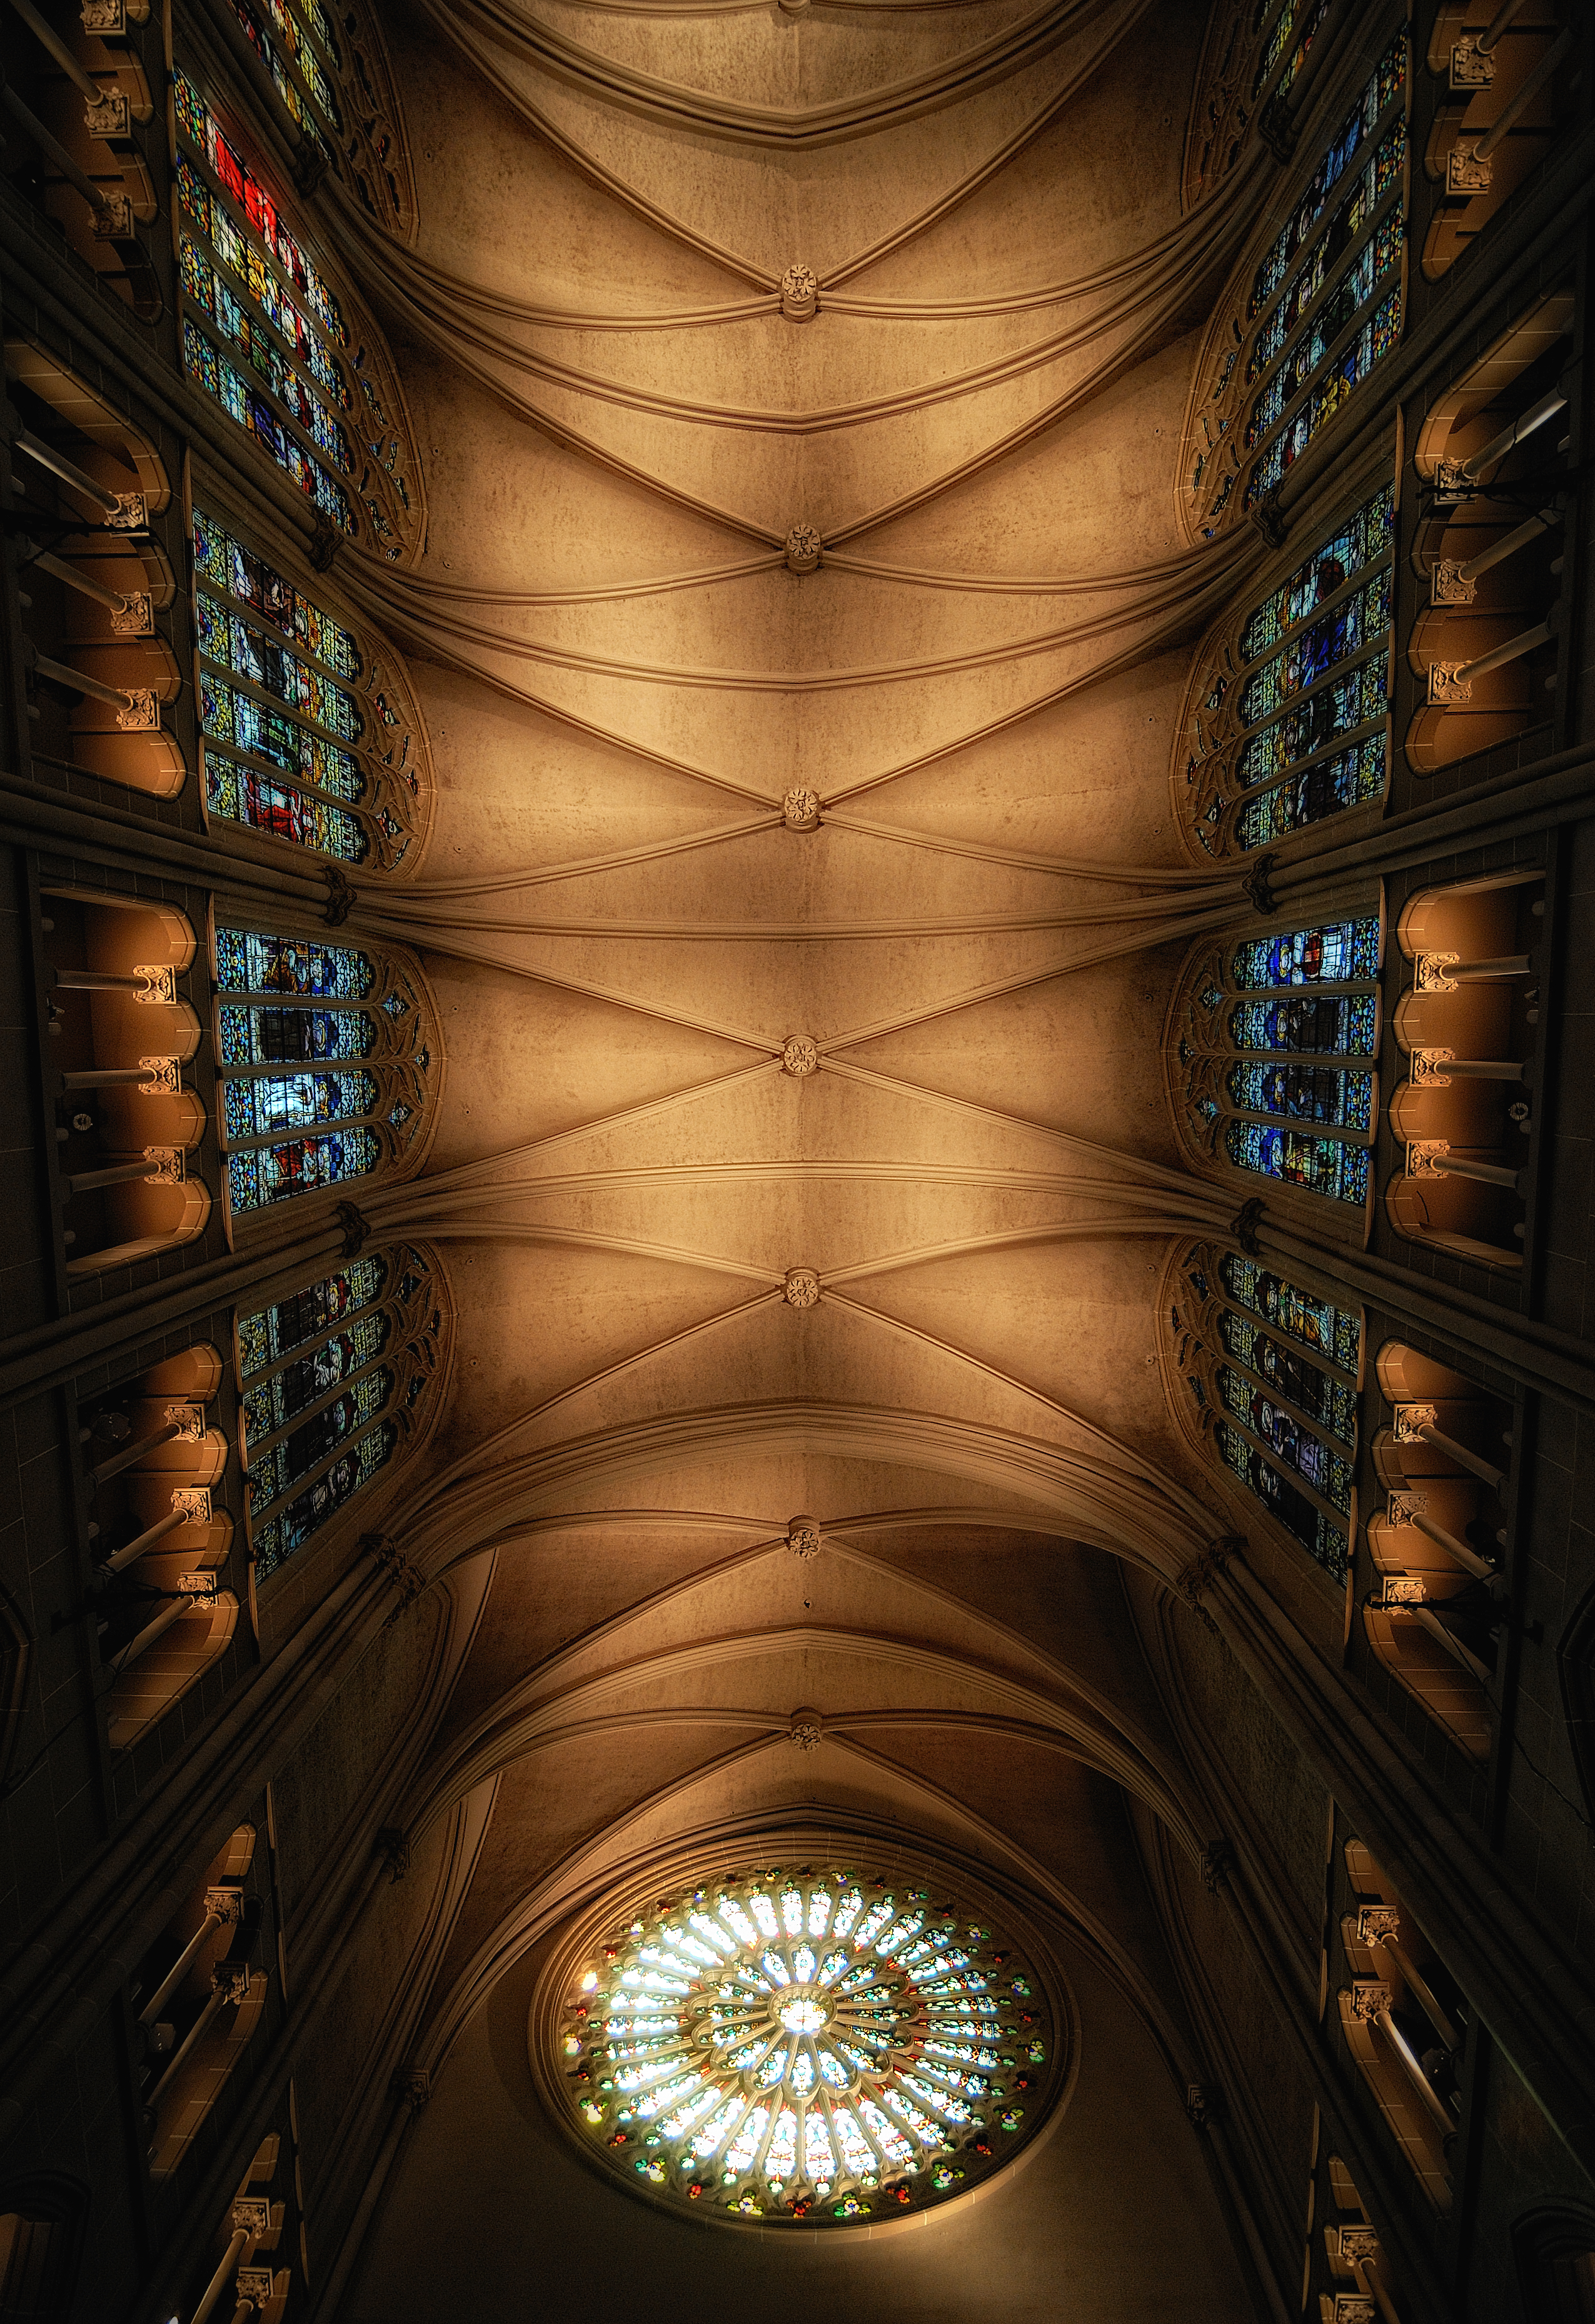 basilica_04